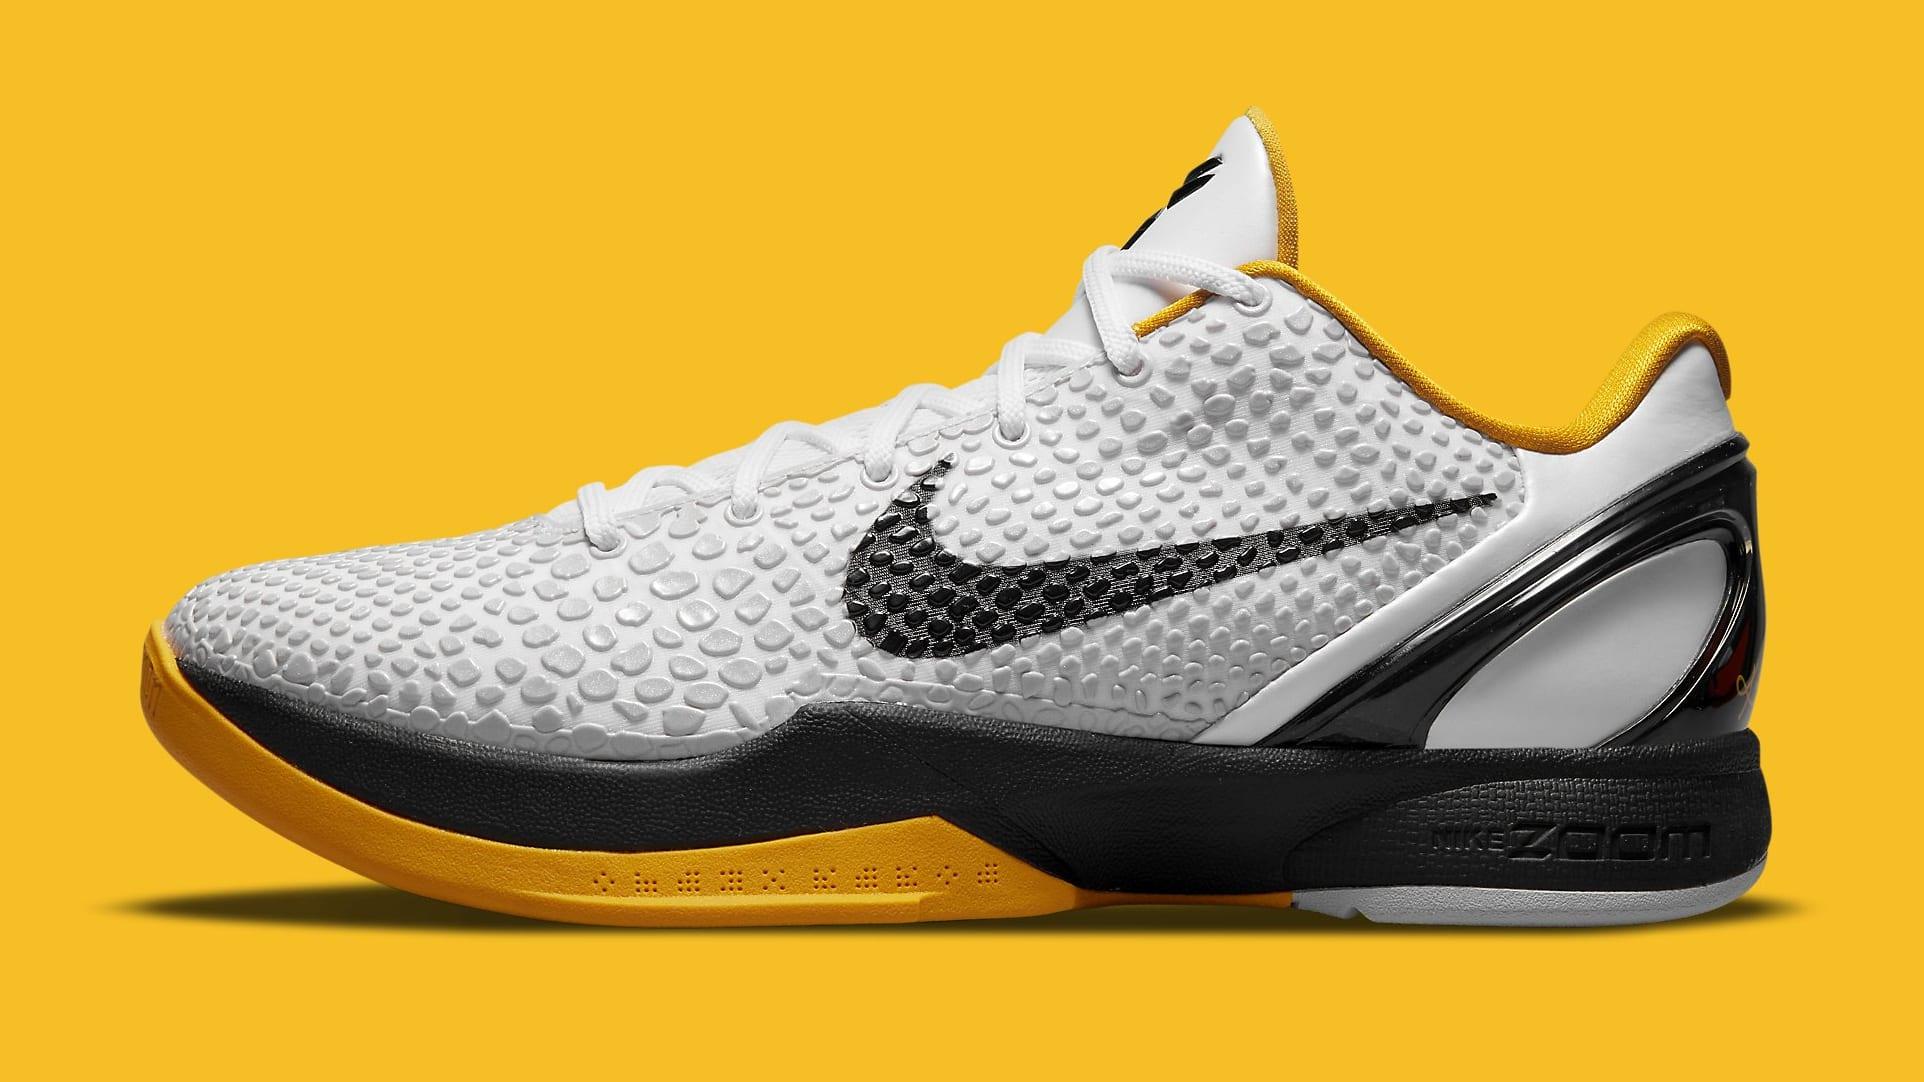 Nike Kobe 6 Protro 'POP' CW2190-100 Lateral